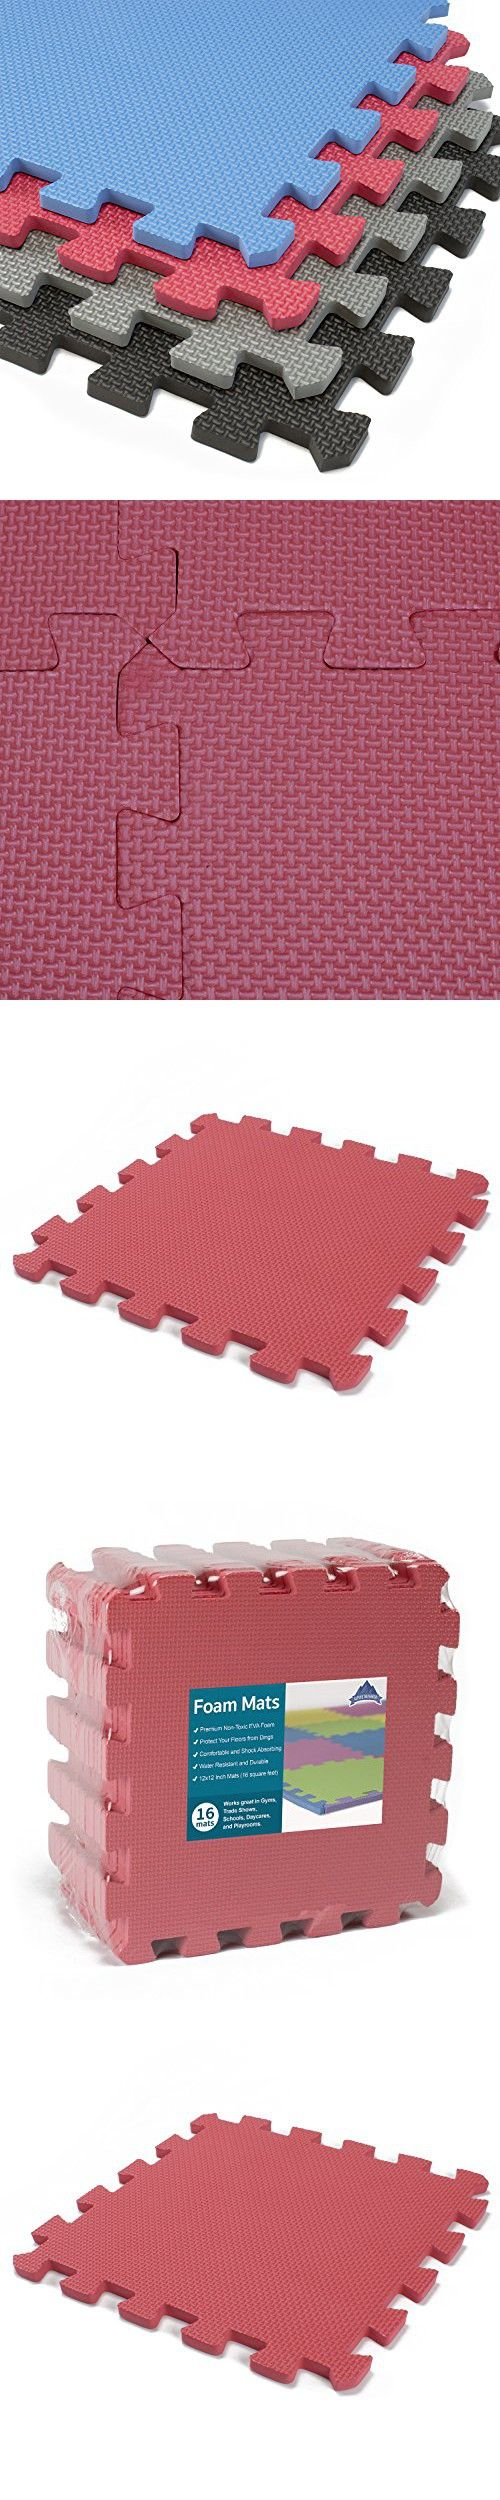 Rubber floor mats for garage gym - Interlocking Foam Mats Thick Eva Exercise Flooring Soft Non Toxic Kids Play Tiles Anti Fatiguegarage Gymbaby